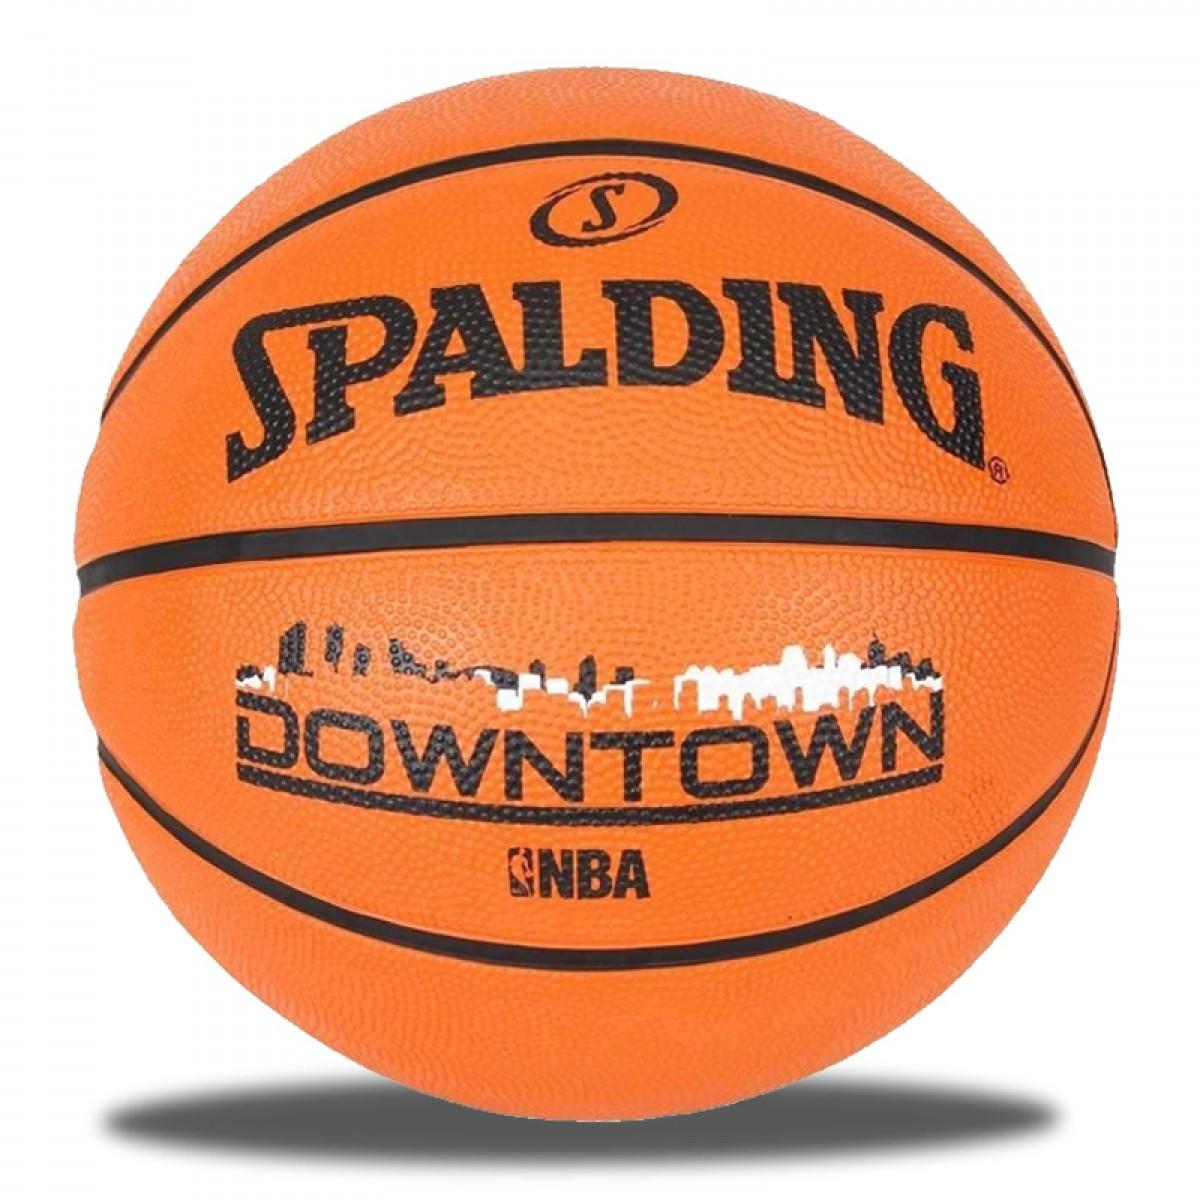 Spalding NBA Downtown Talla 7